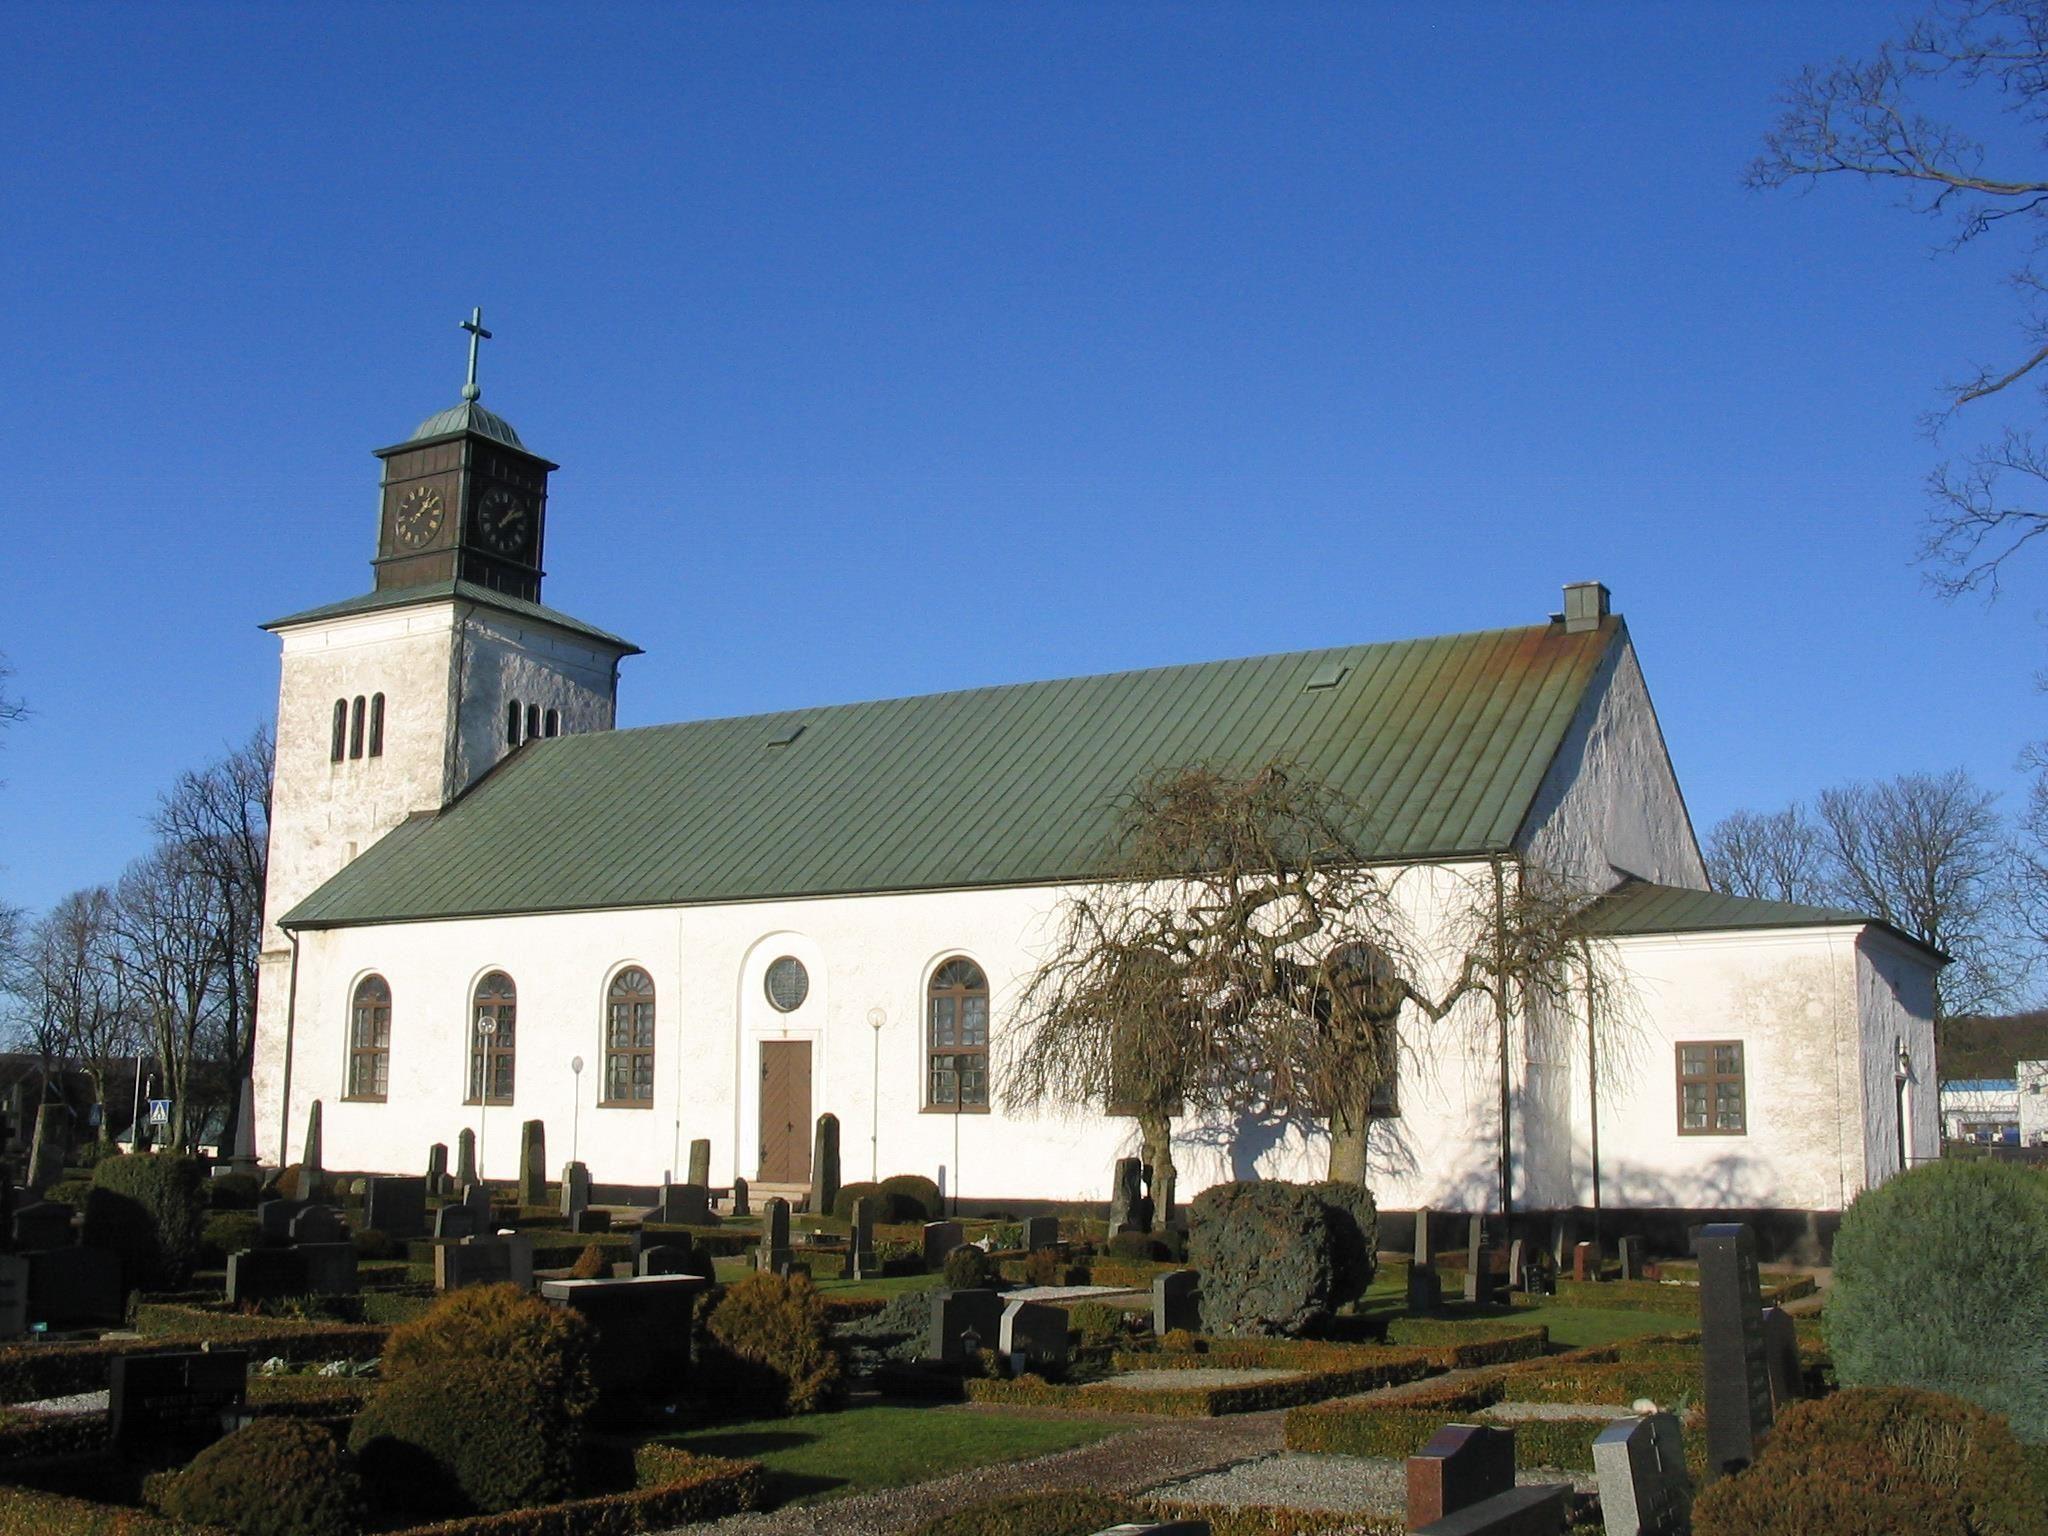 Hjärnarps Kirche